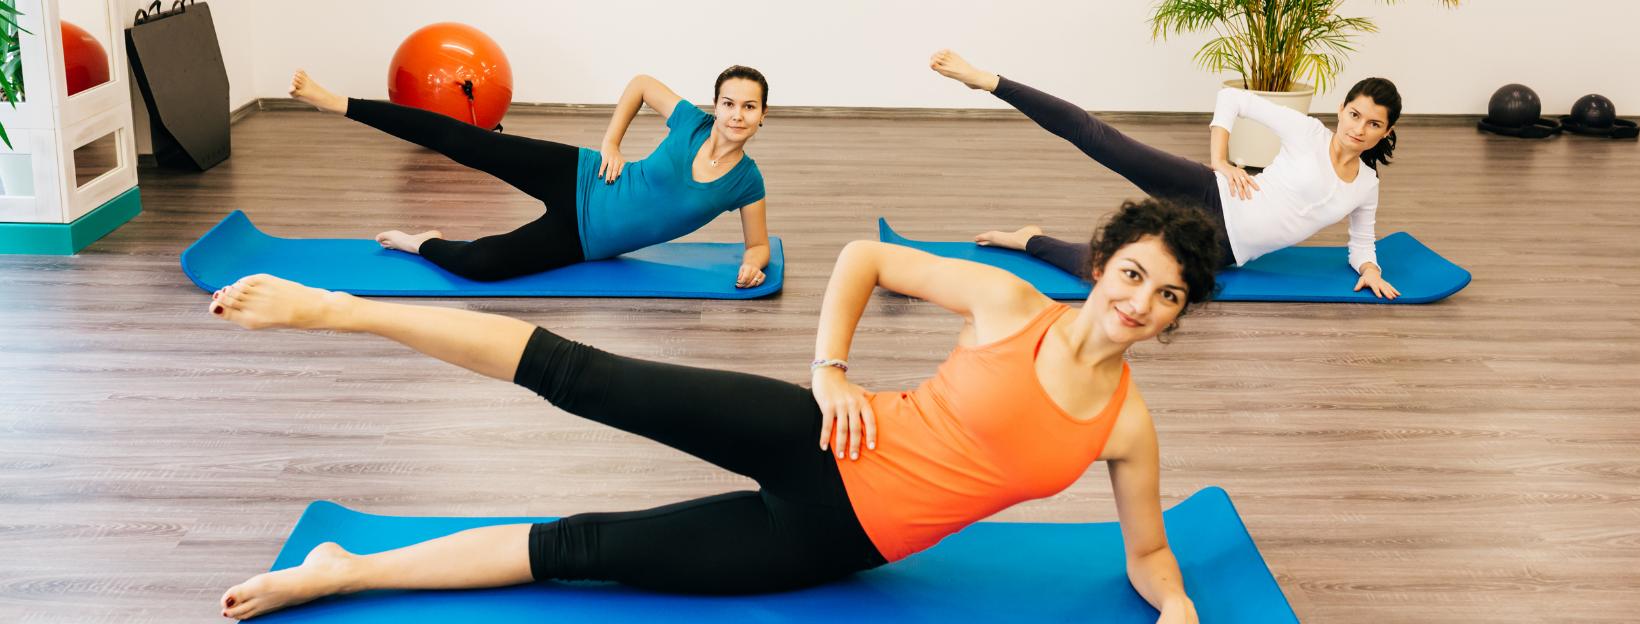 Yogalates class